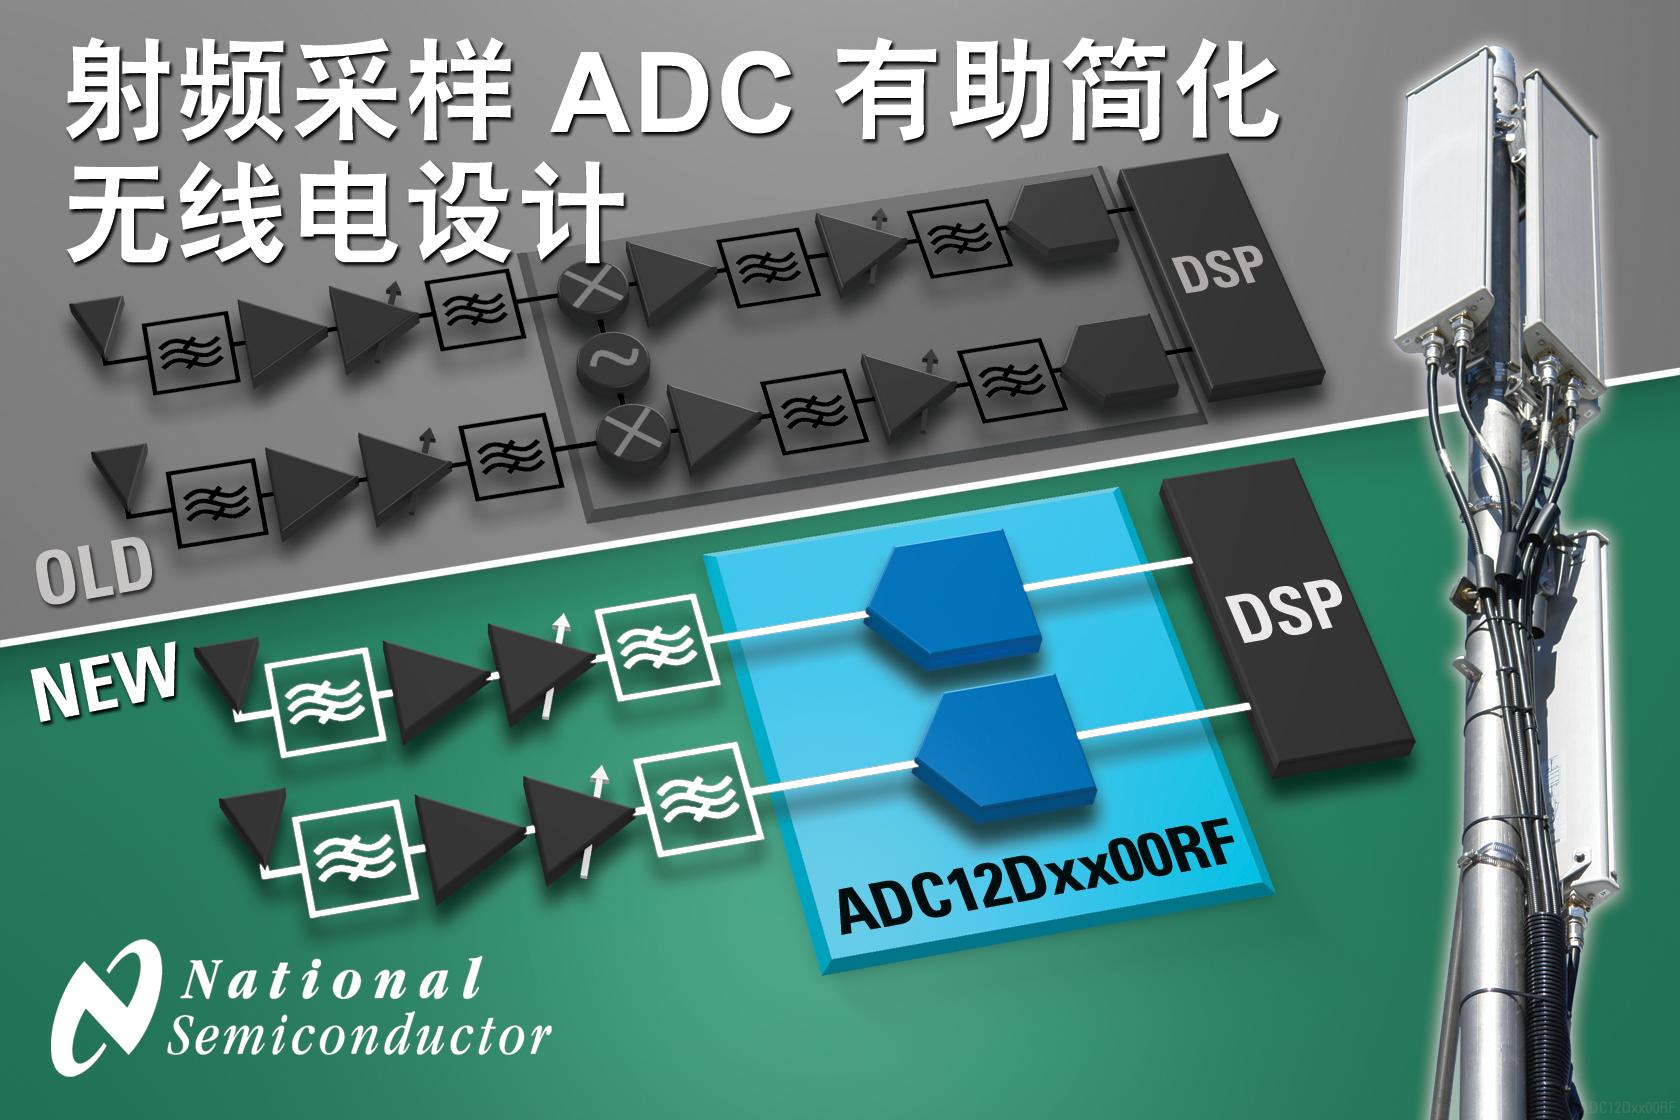 NS突破性直接射频采样ADC彻底改变无线电架构